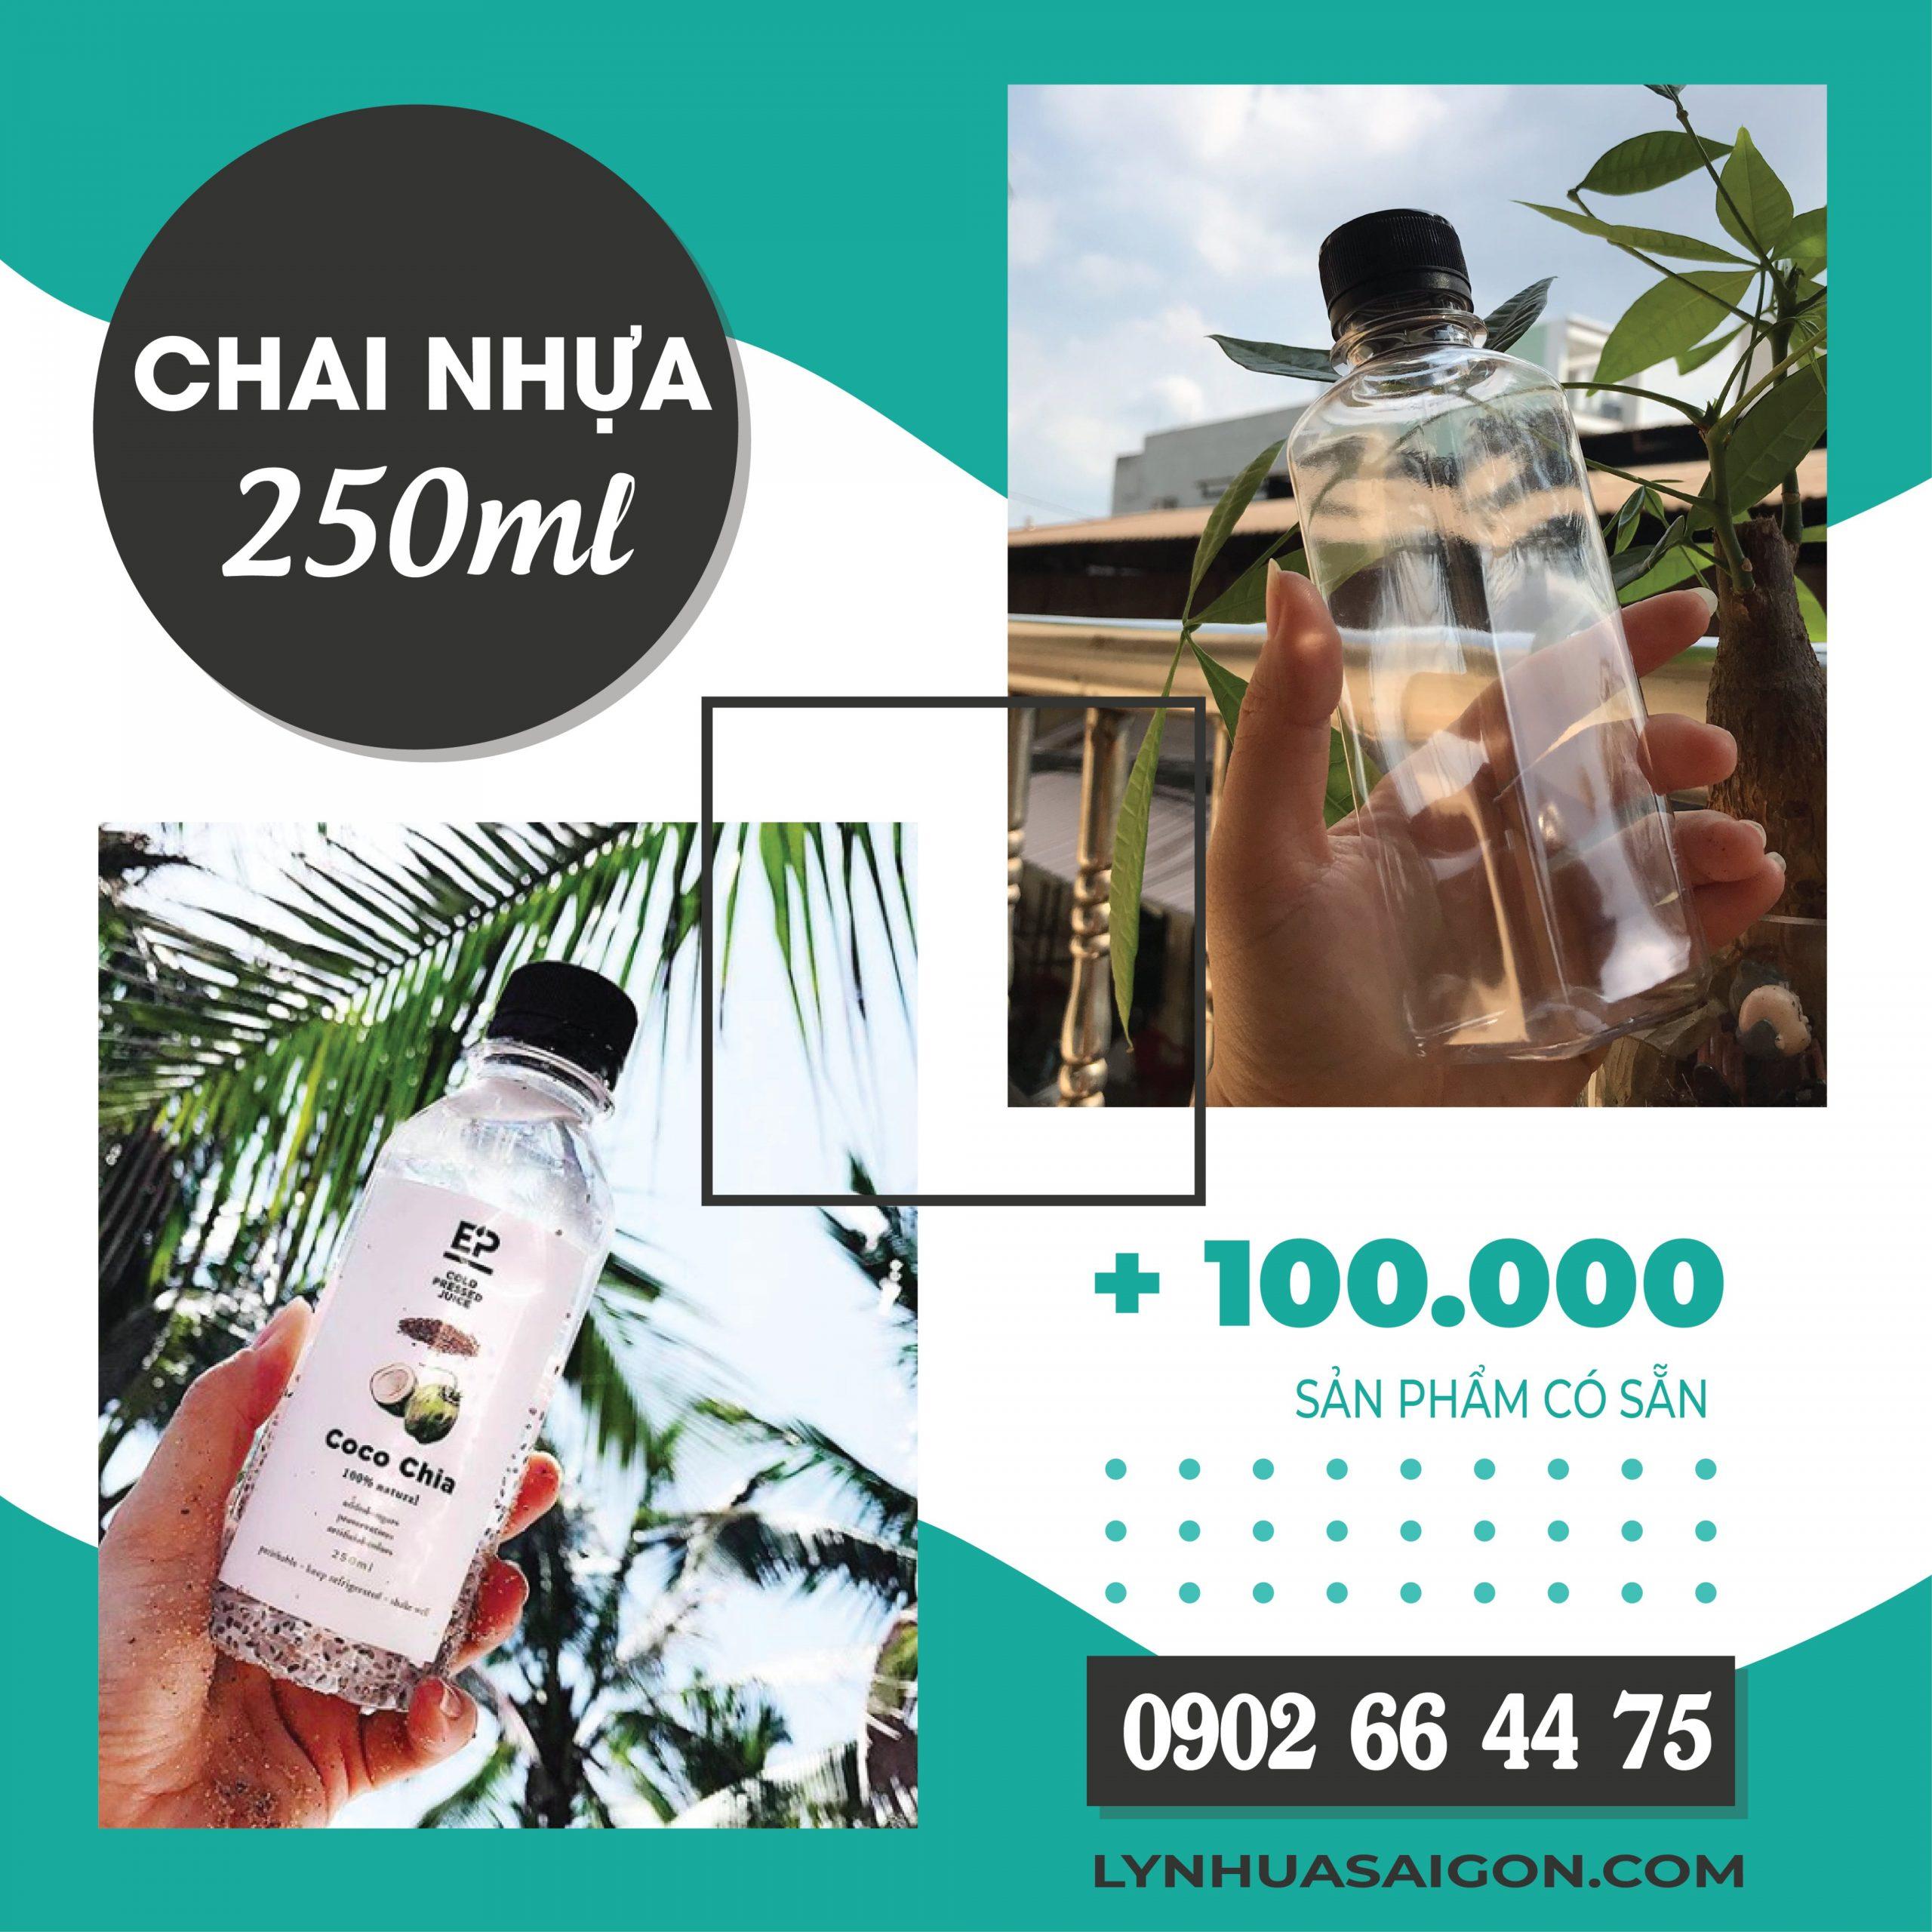 mua-chai-nhua-250ml-chat-luong